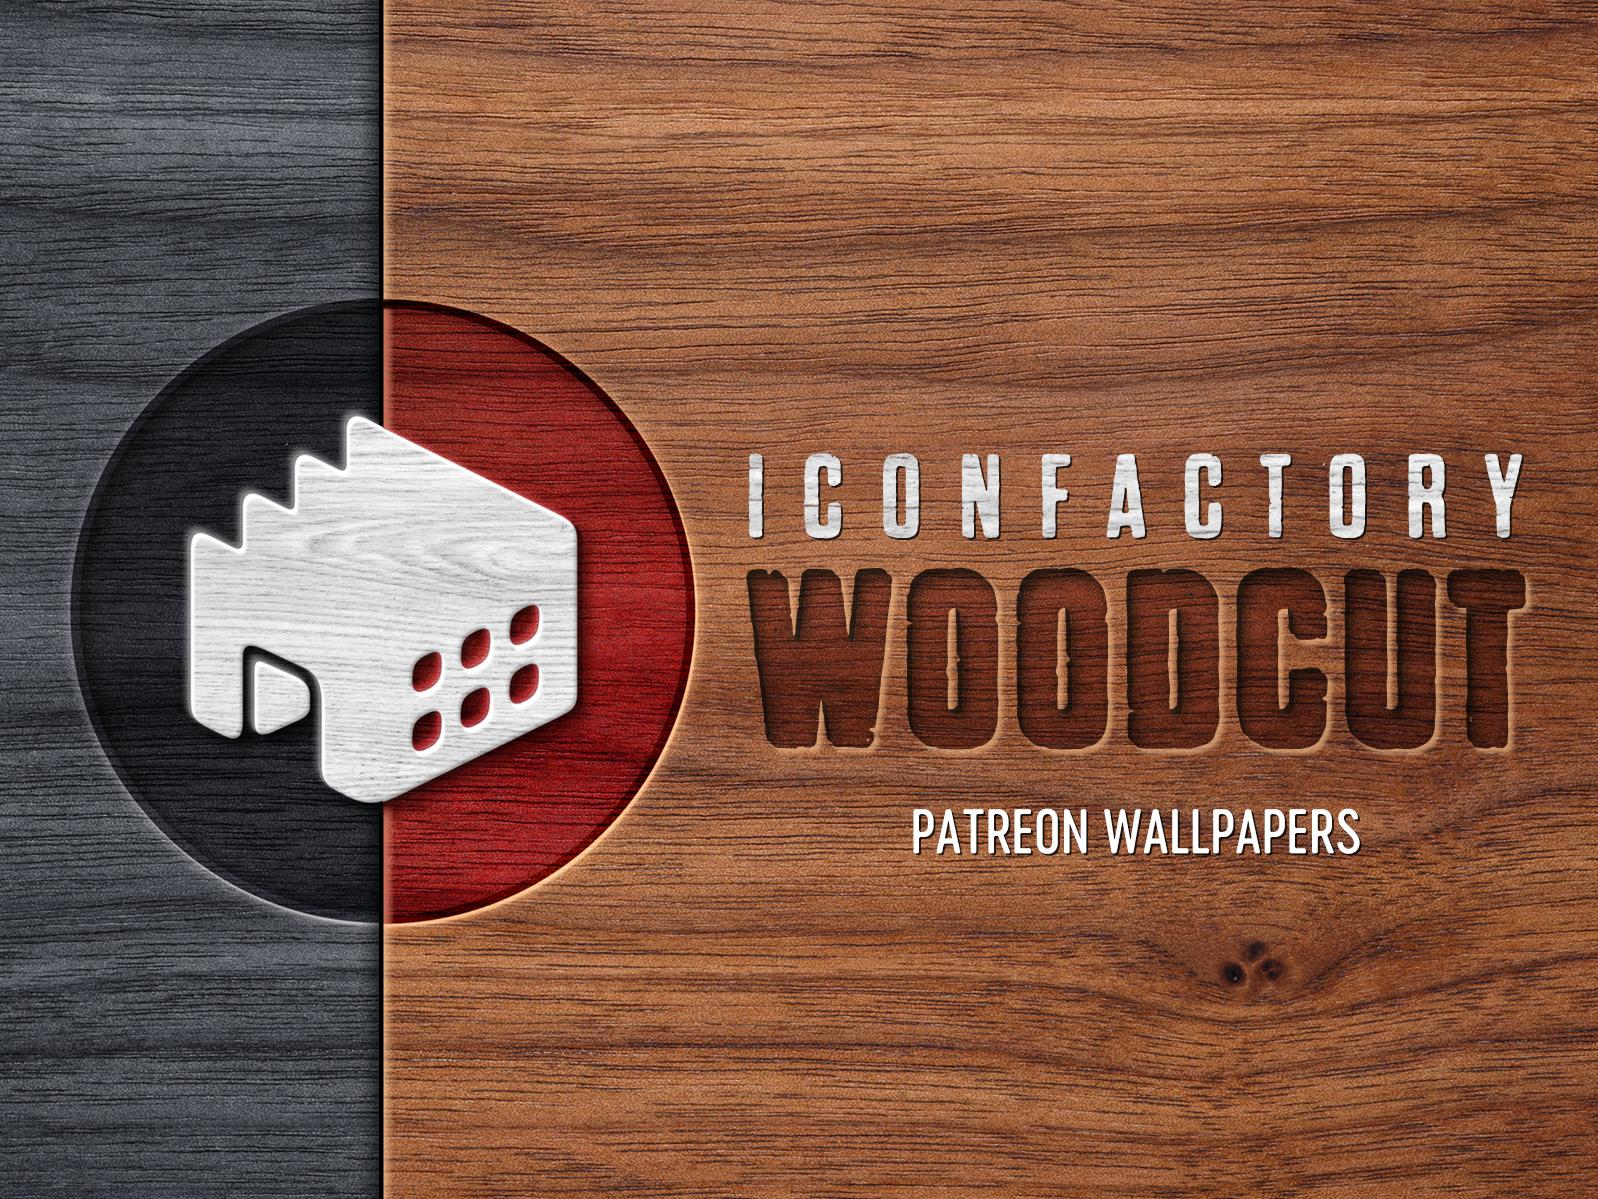 Iconfactory Woodcut Wallpapers patreon logo branding organic wood natural iphone ipad desktop wallpaper desktop iconfactory